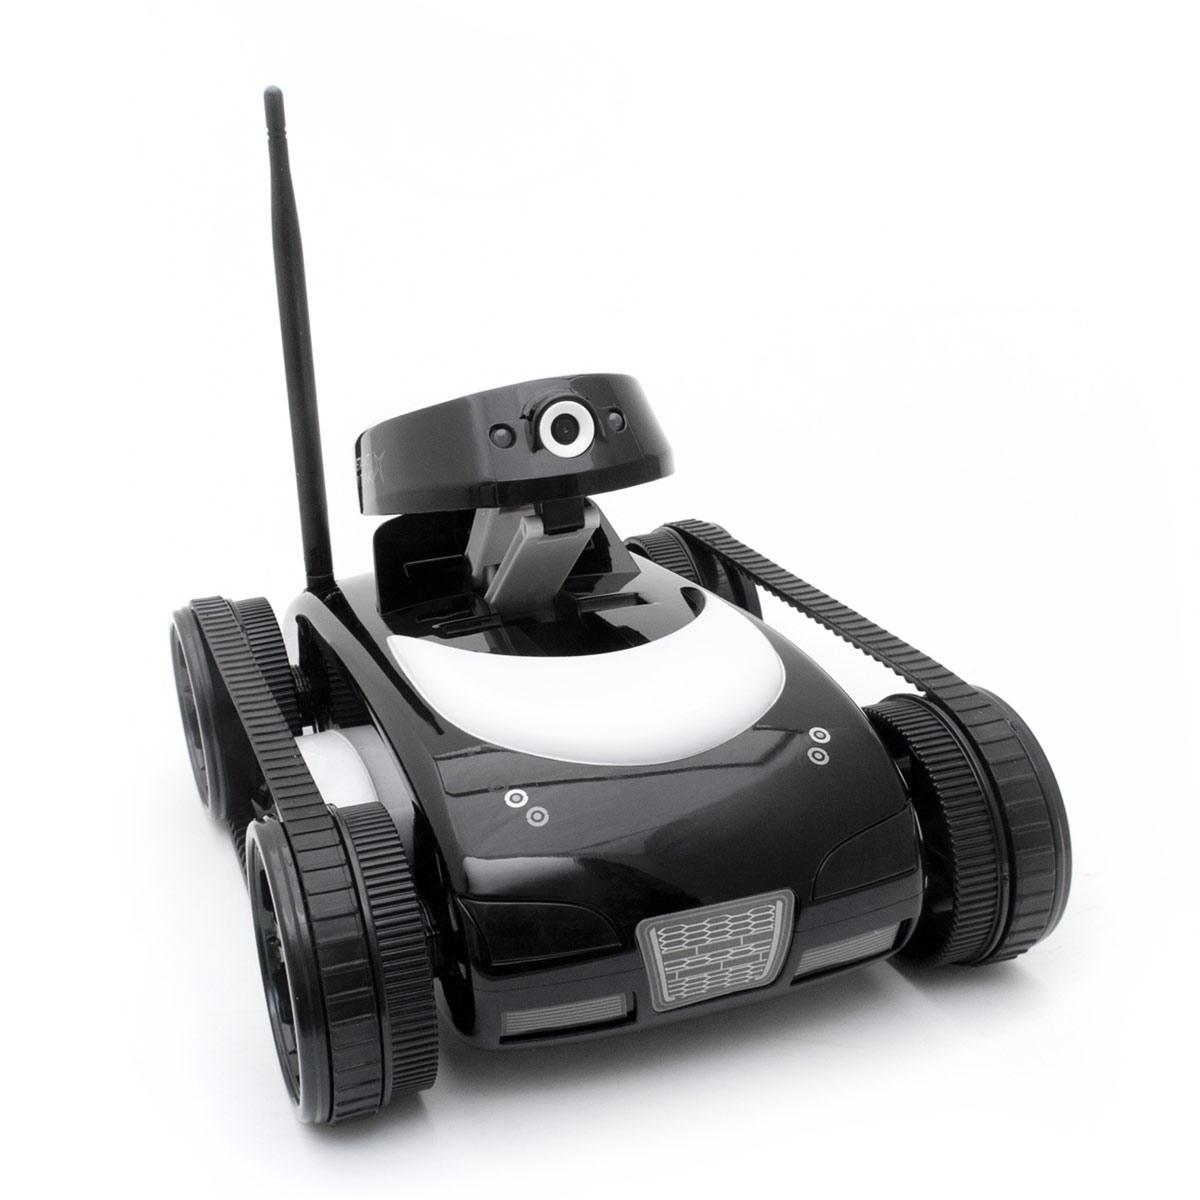 rc dronen tank wlan kamera panzer iphone ipad fernsteuerbar. Black Bedroom Furniture Sets. Home Design Ideas